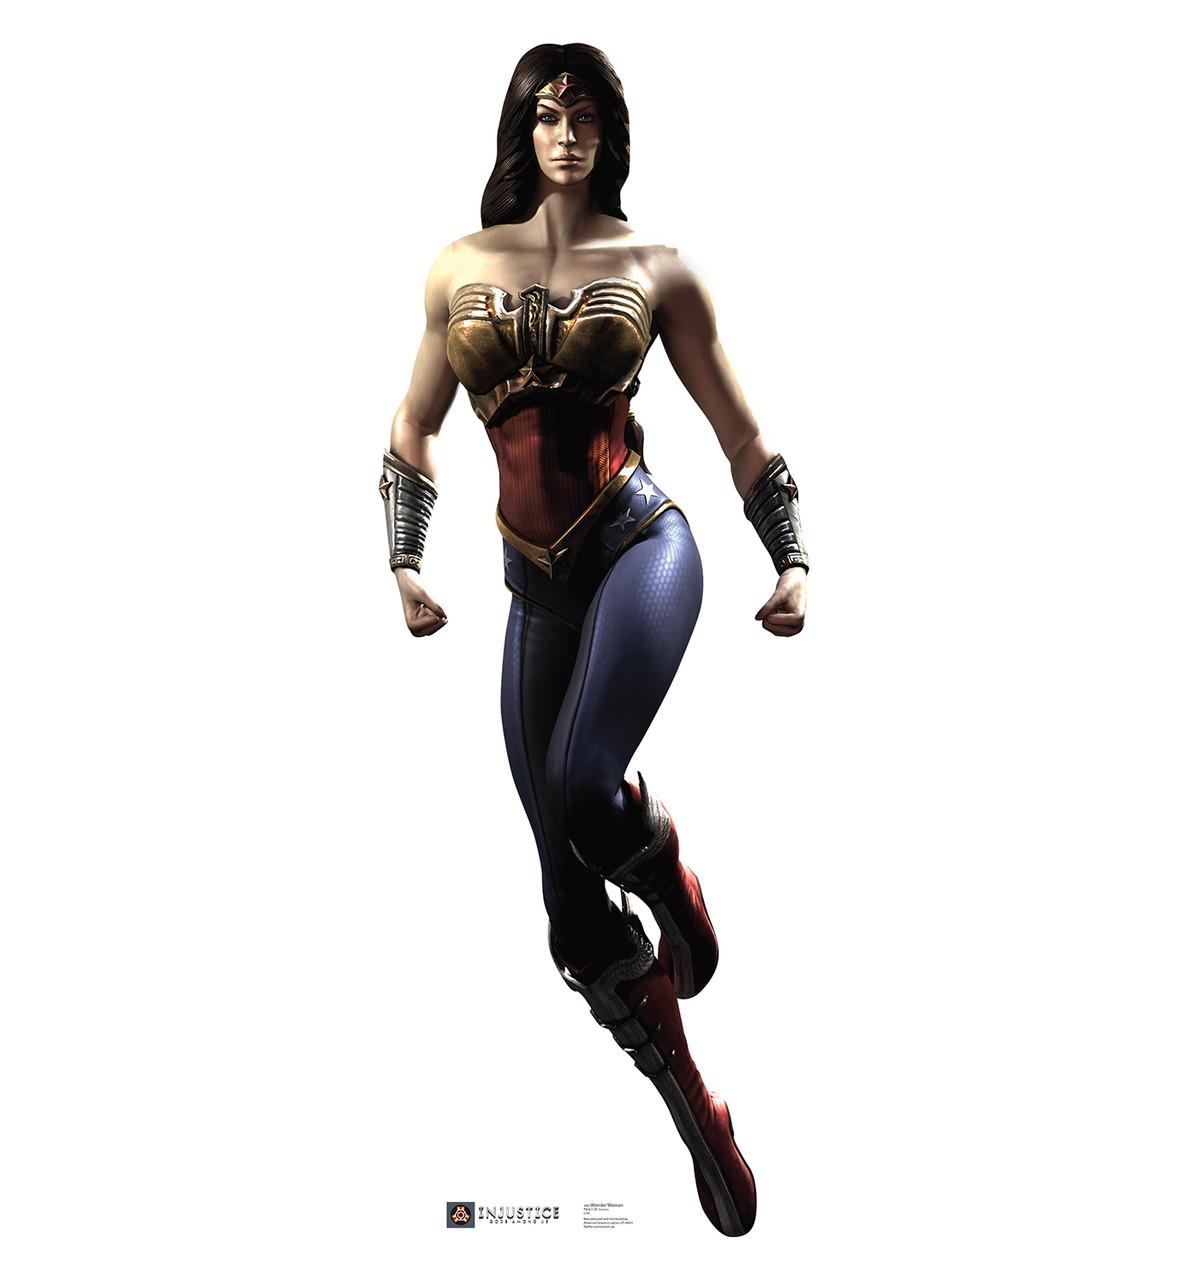 Life-size Wonder Woman - Injustice Gods Among Us Cardboard Standup